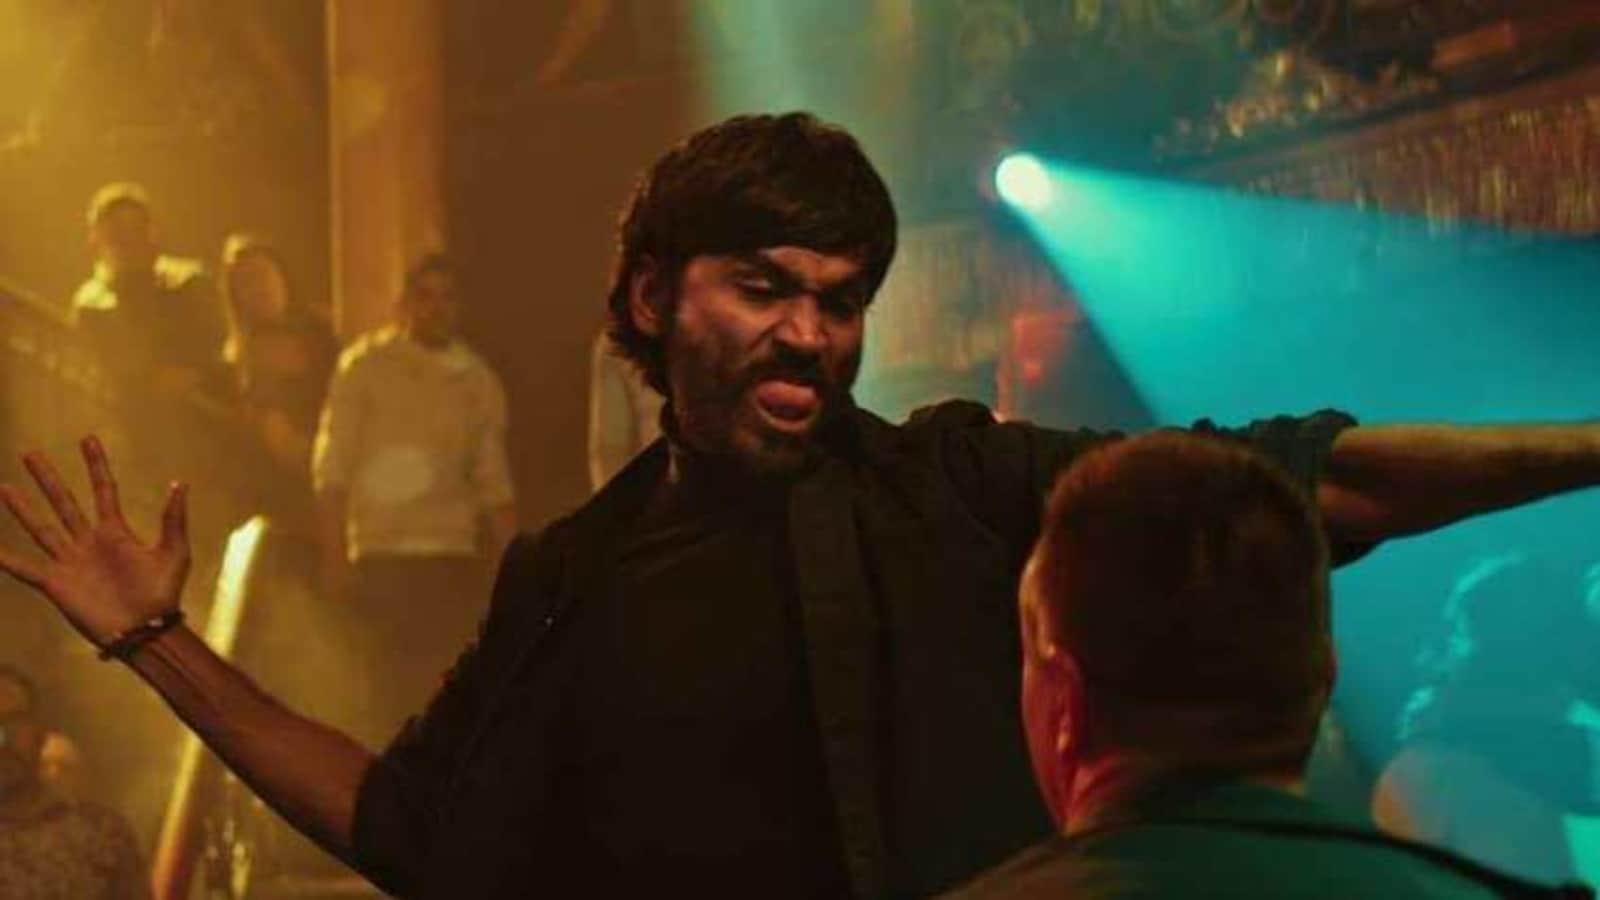 Jagame Thandhiram teaser: Dhanush's upcoming movie with Karthik Subbaraj to release on Netflix - Hindustan Times